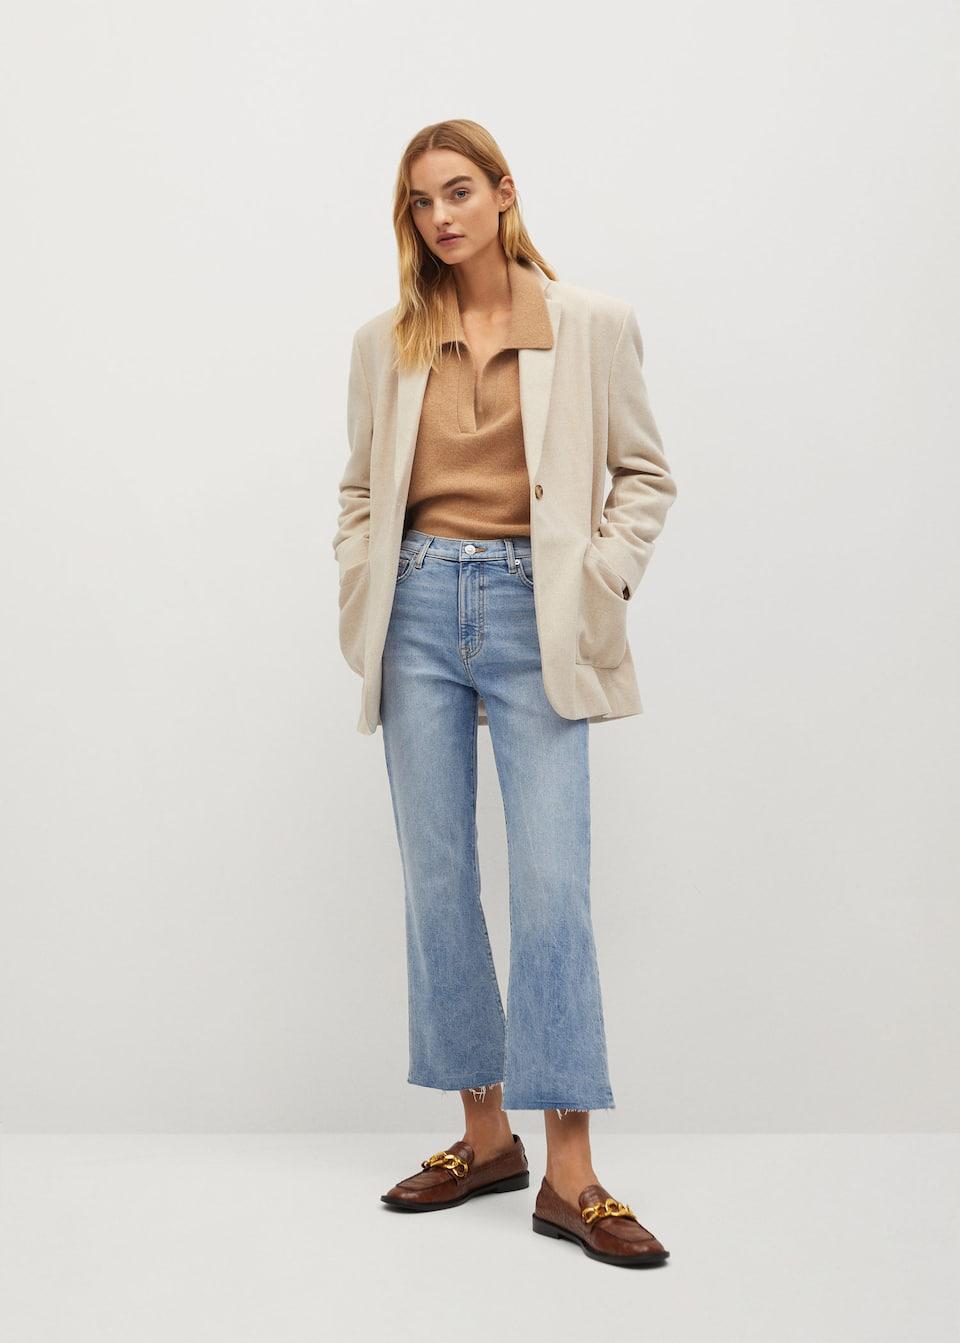 Crop flared jeans - General plane